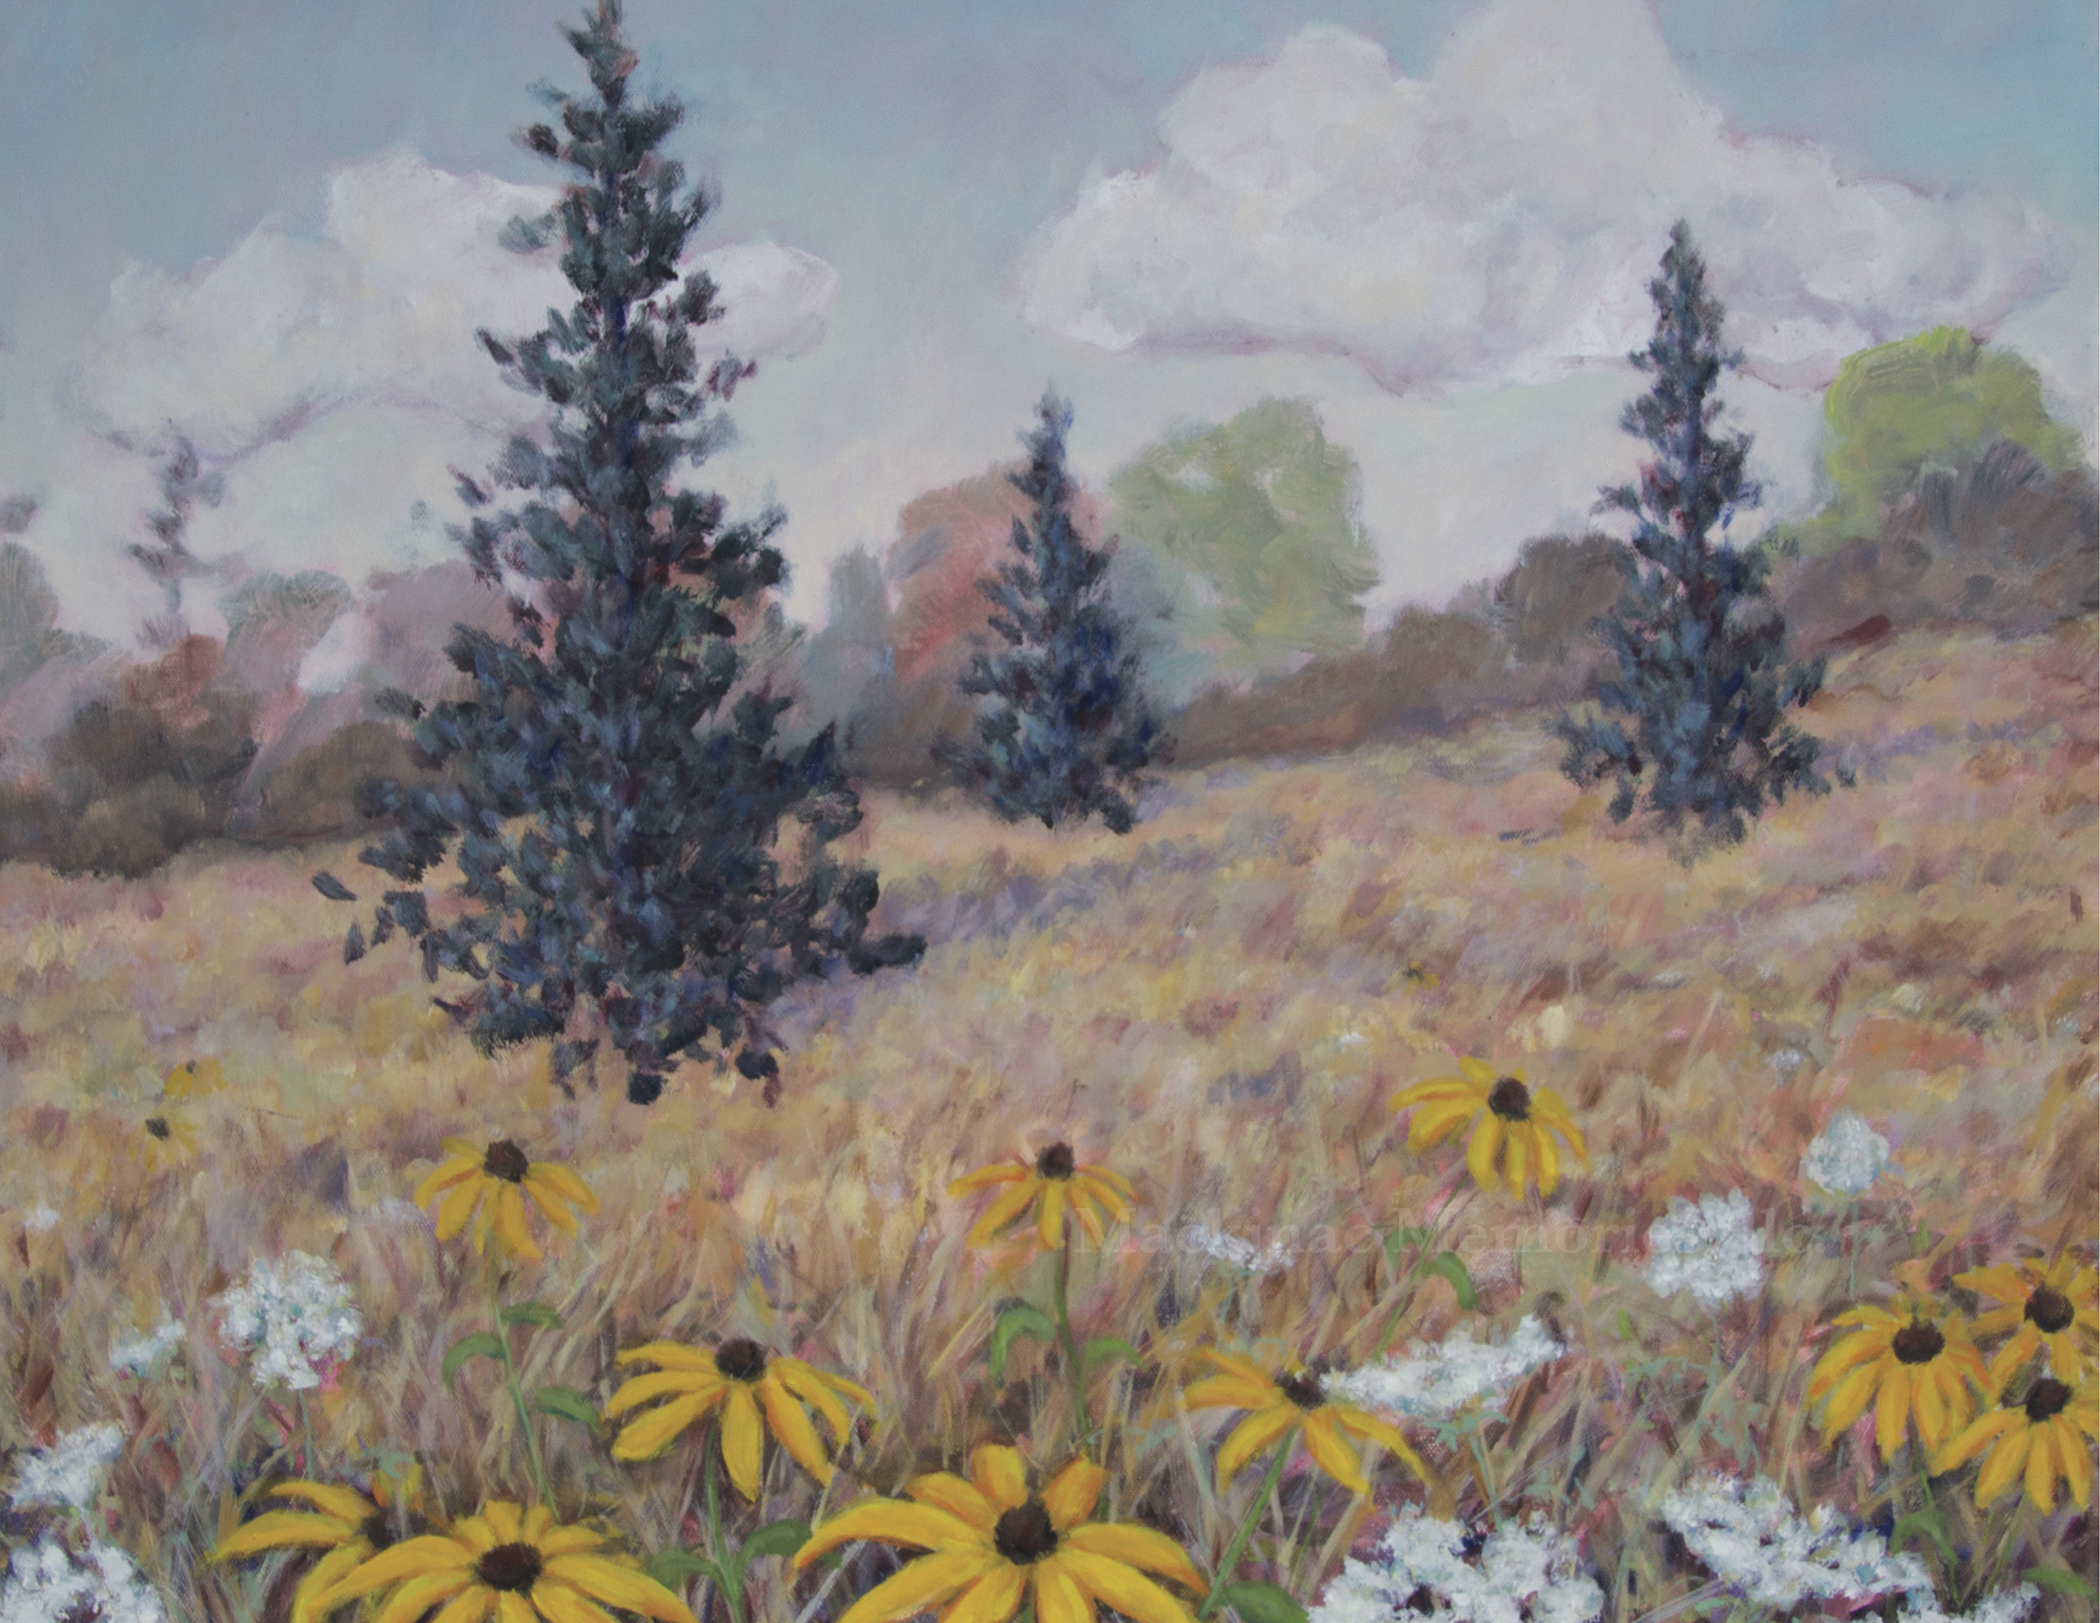 U.P. Painting